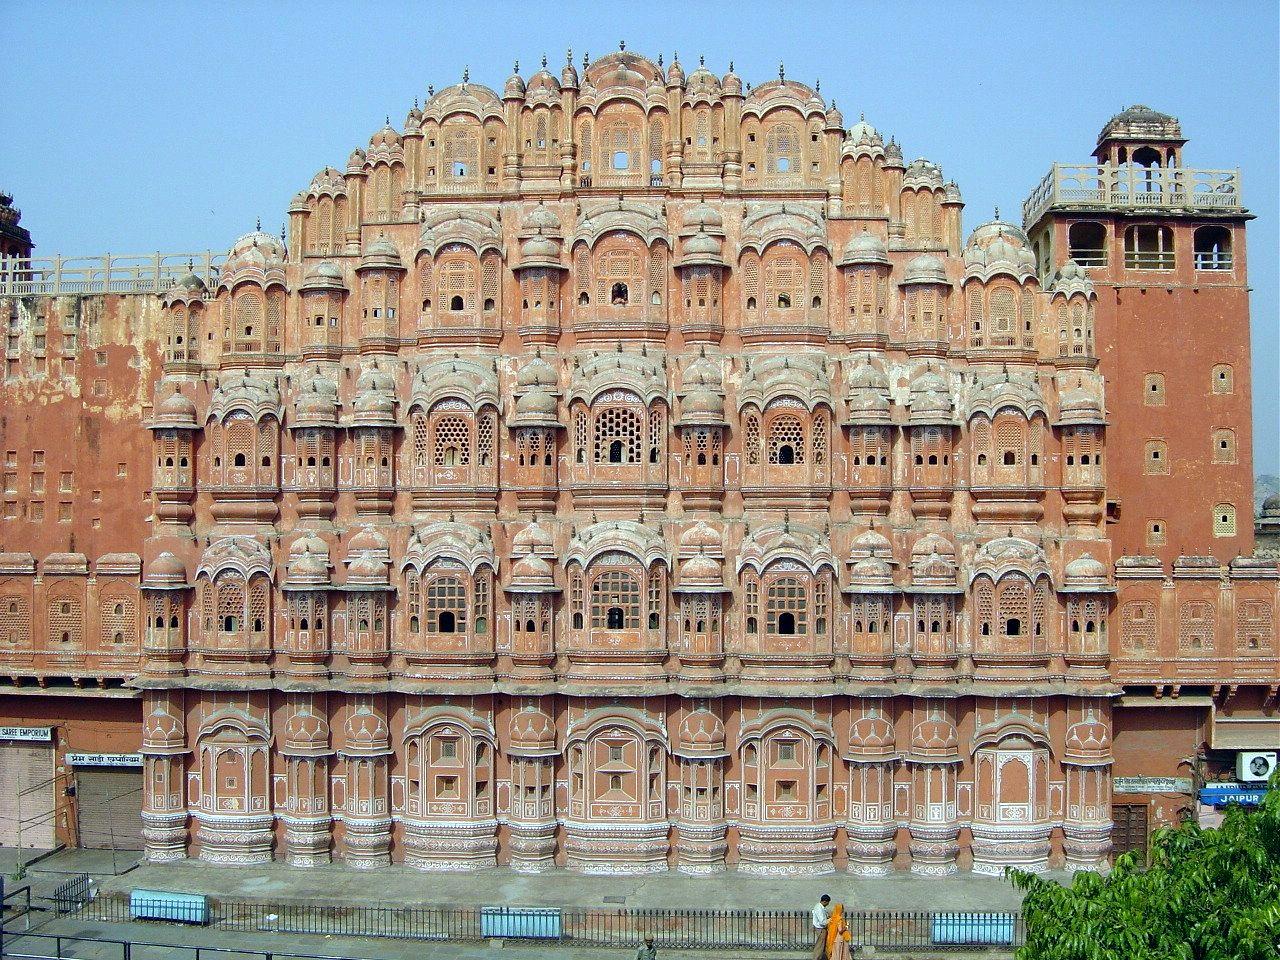 Indian Land Photos Latest Indian Land Photo Galleries in Hindi Indian land ke photo